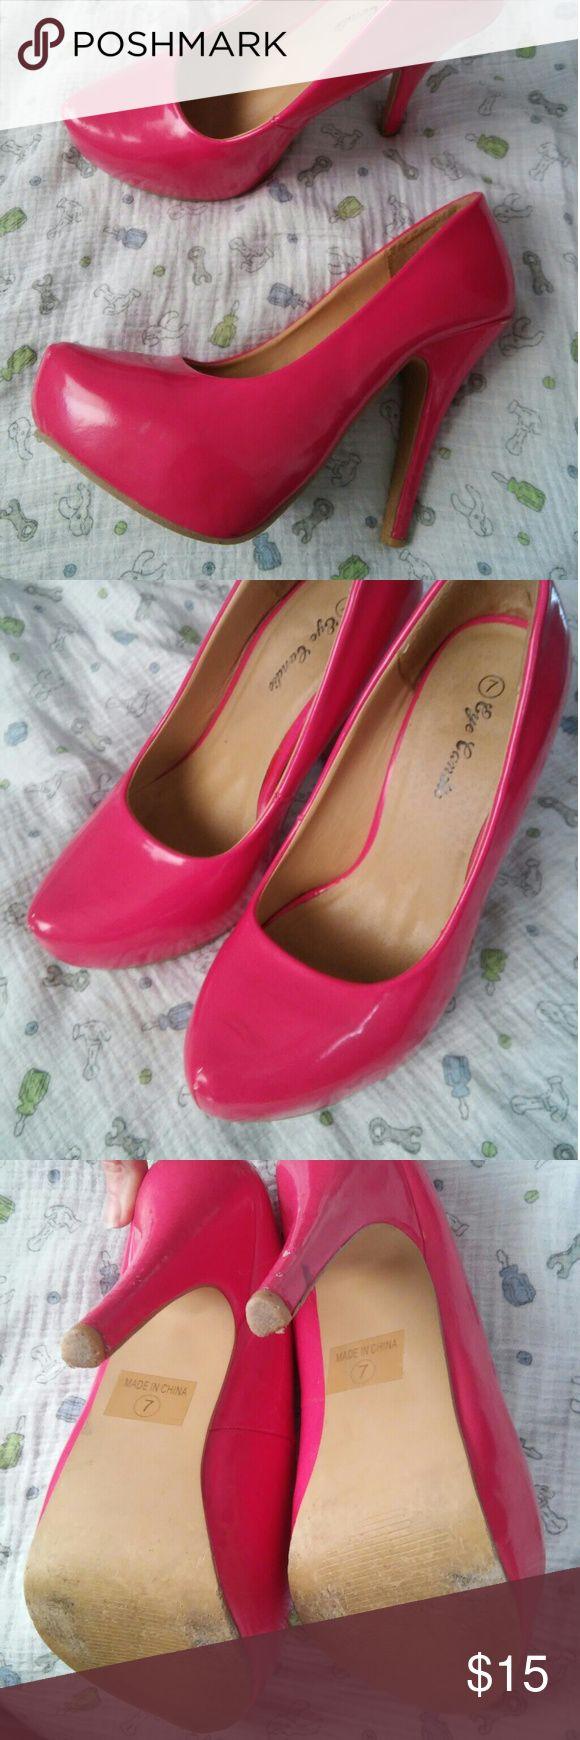 Hotttt pink heels Very sexy high heels slightly worn as seen in pics. Still great shoes! Shoes Heels